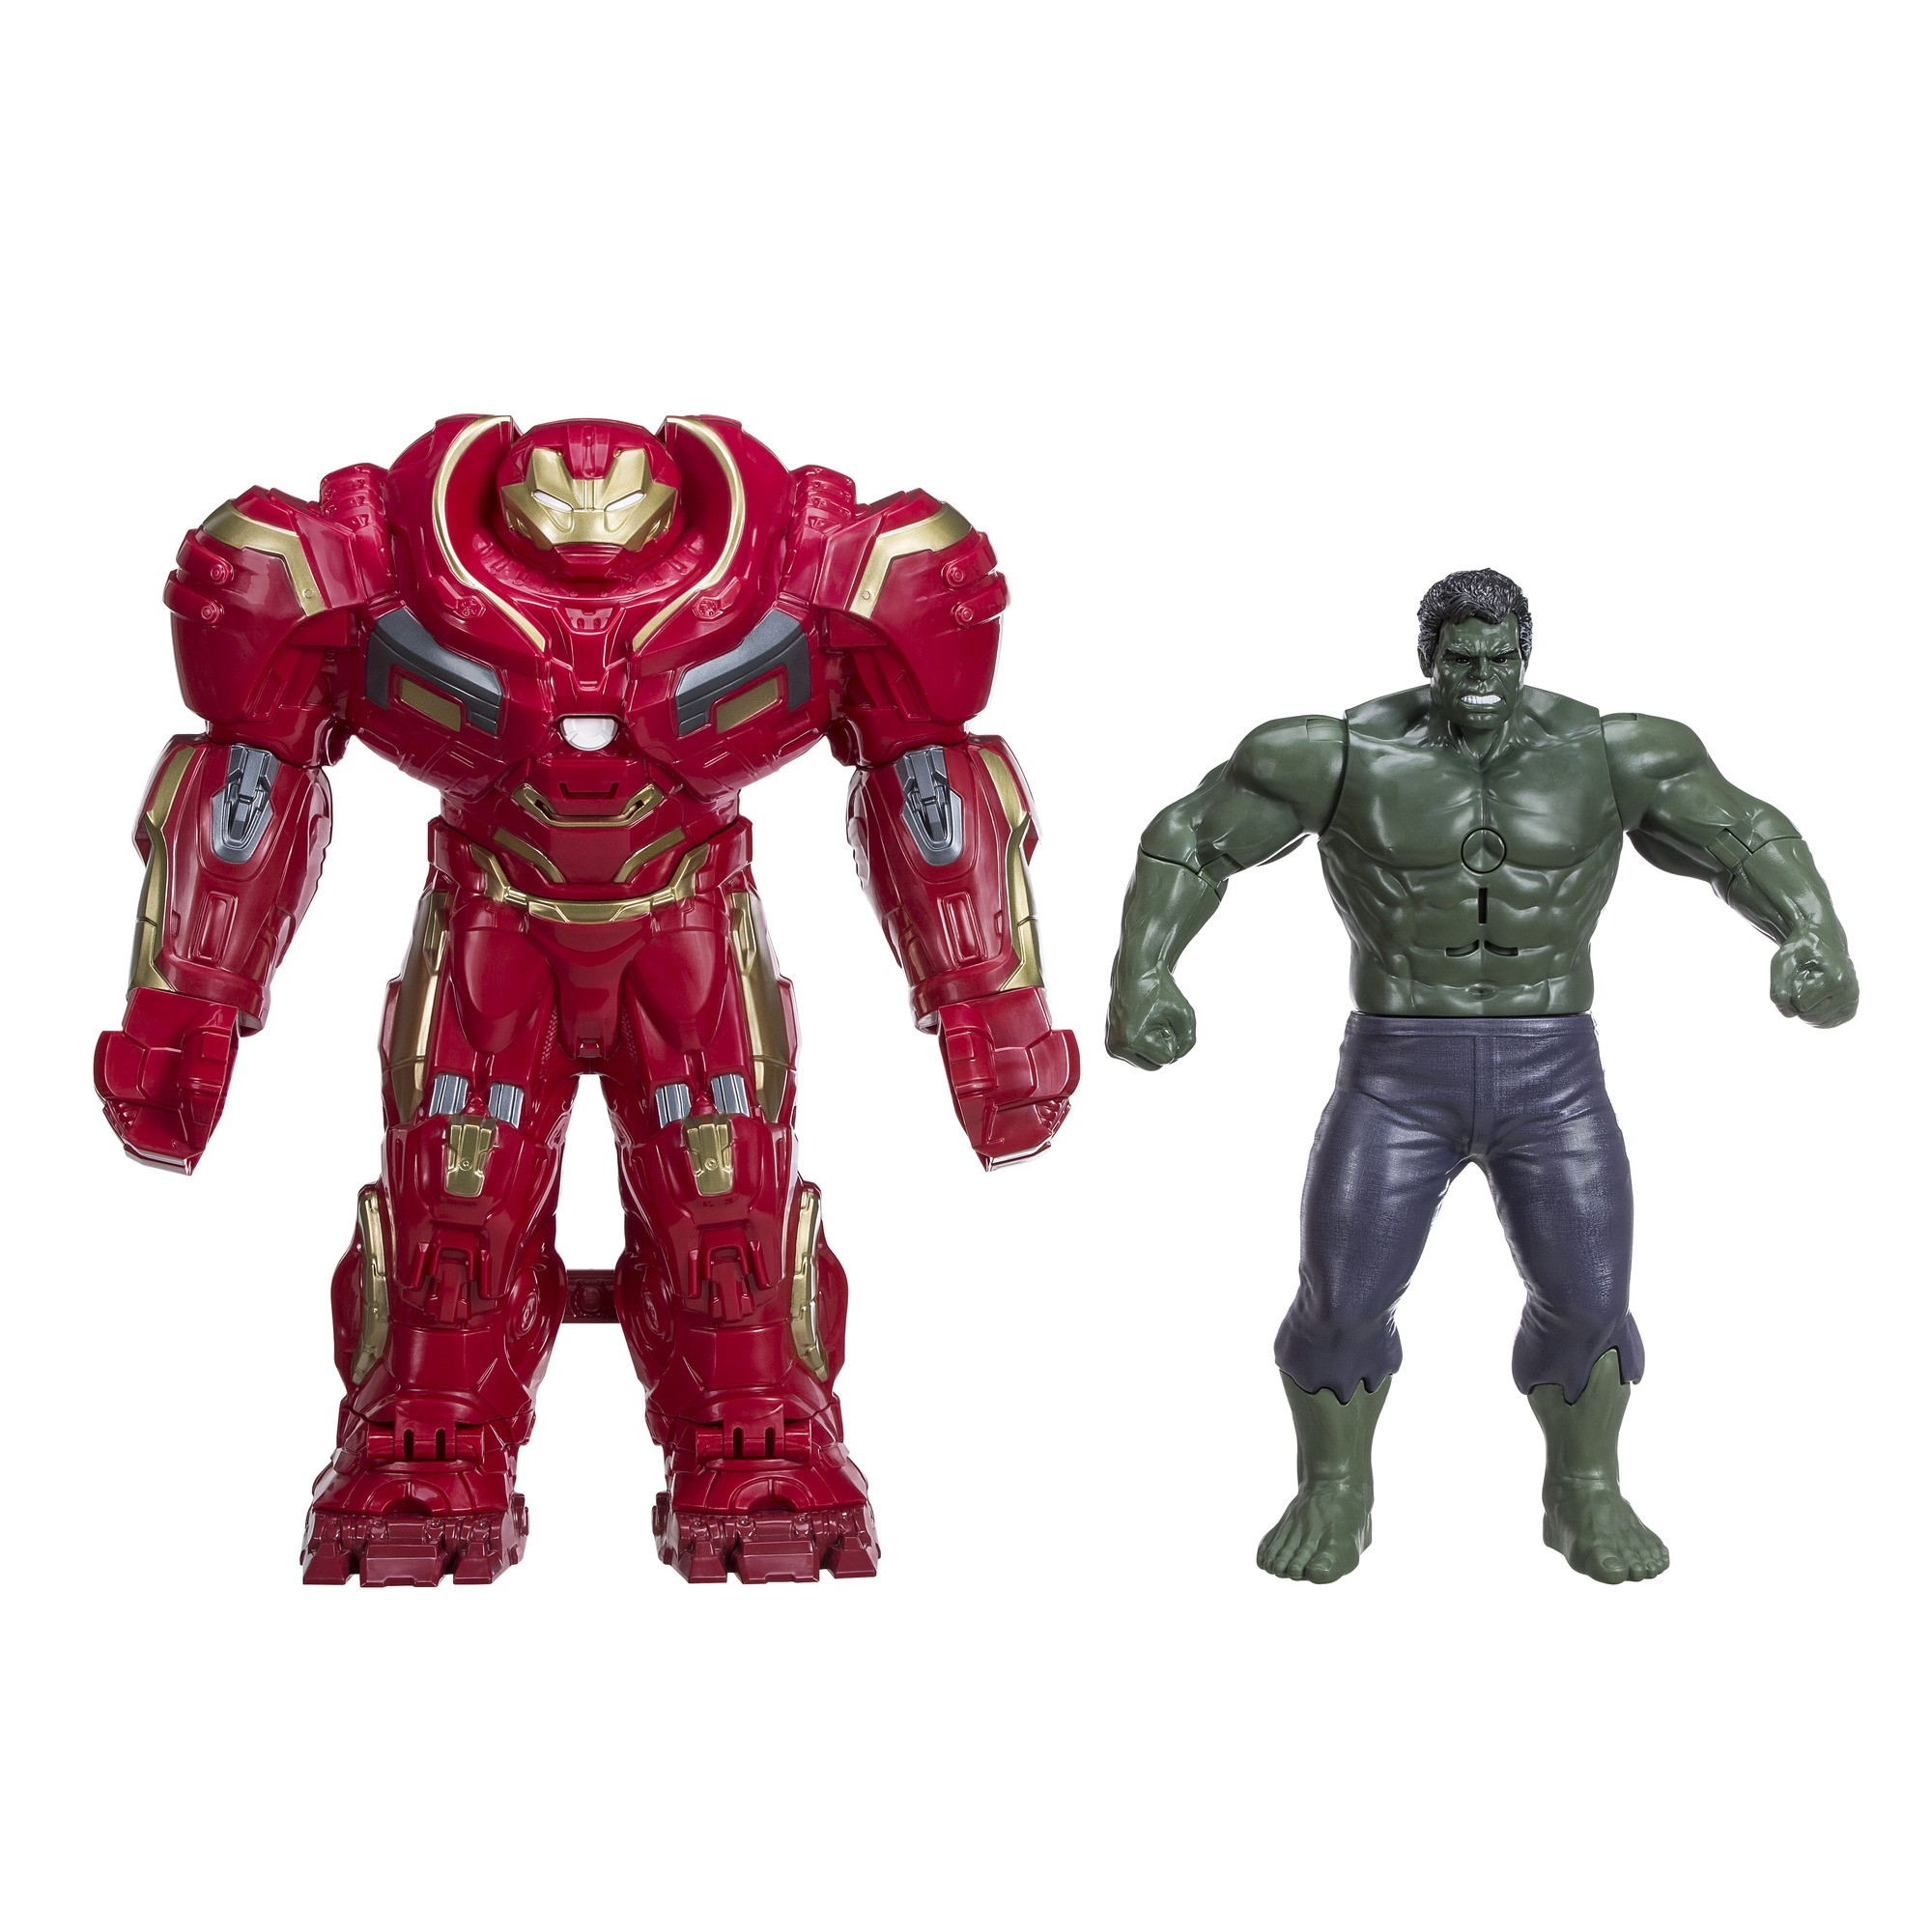 Marvel Avengers: Infinity War Hulk Out Hulkbuster by AVENGERS